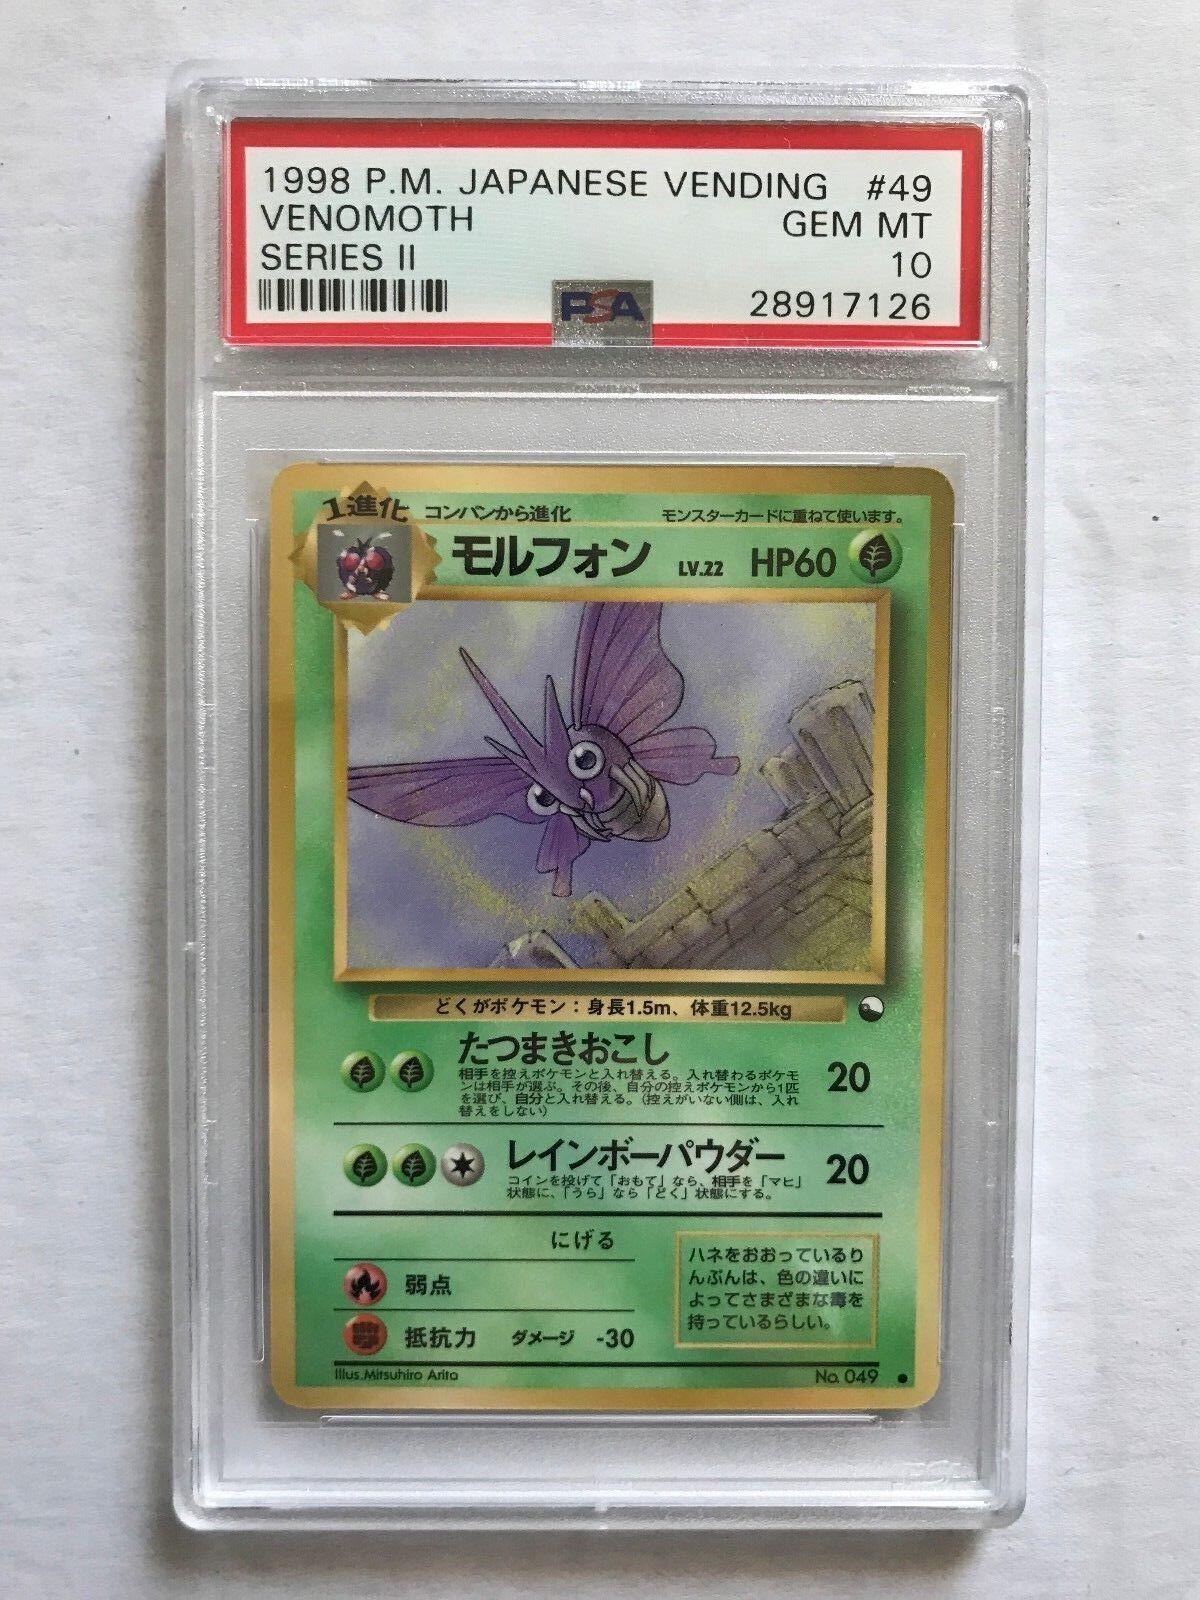 1998 Japanese Pokemon Card Venomoth Vending Series 2 Glossy PSA 10 GEM Mint